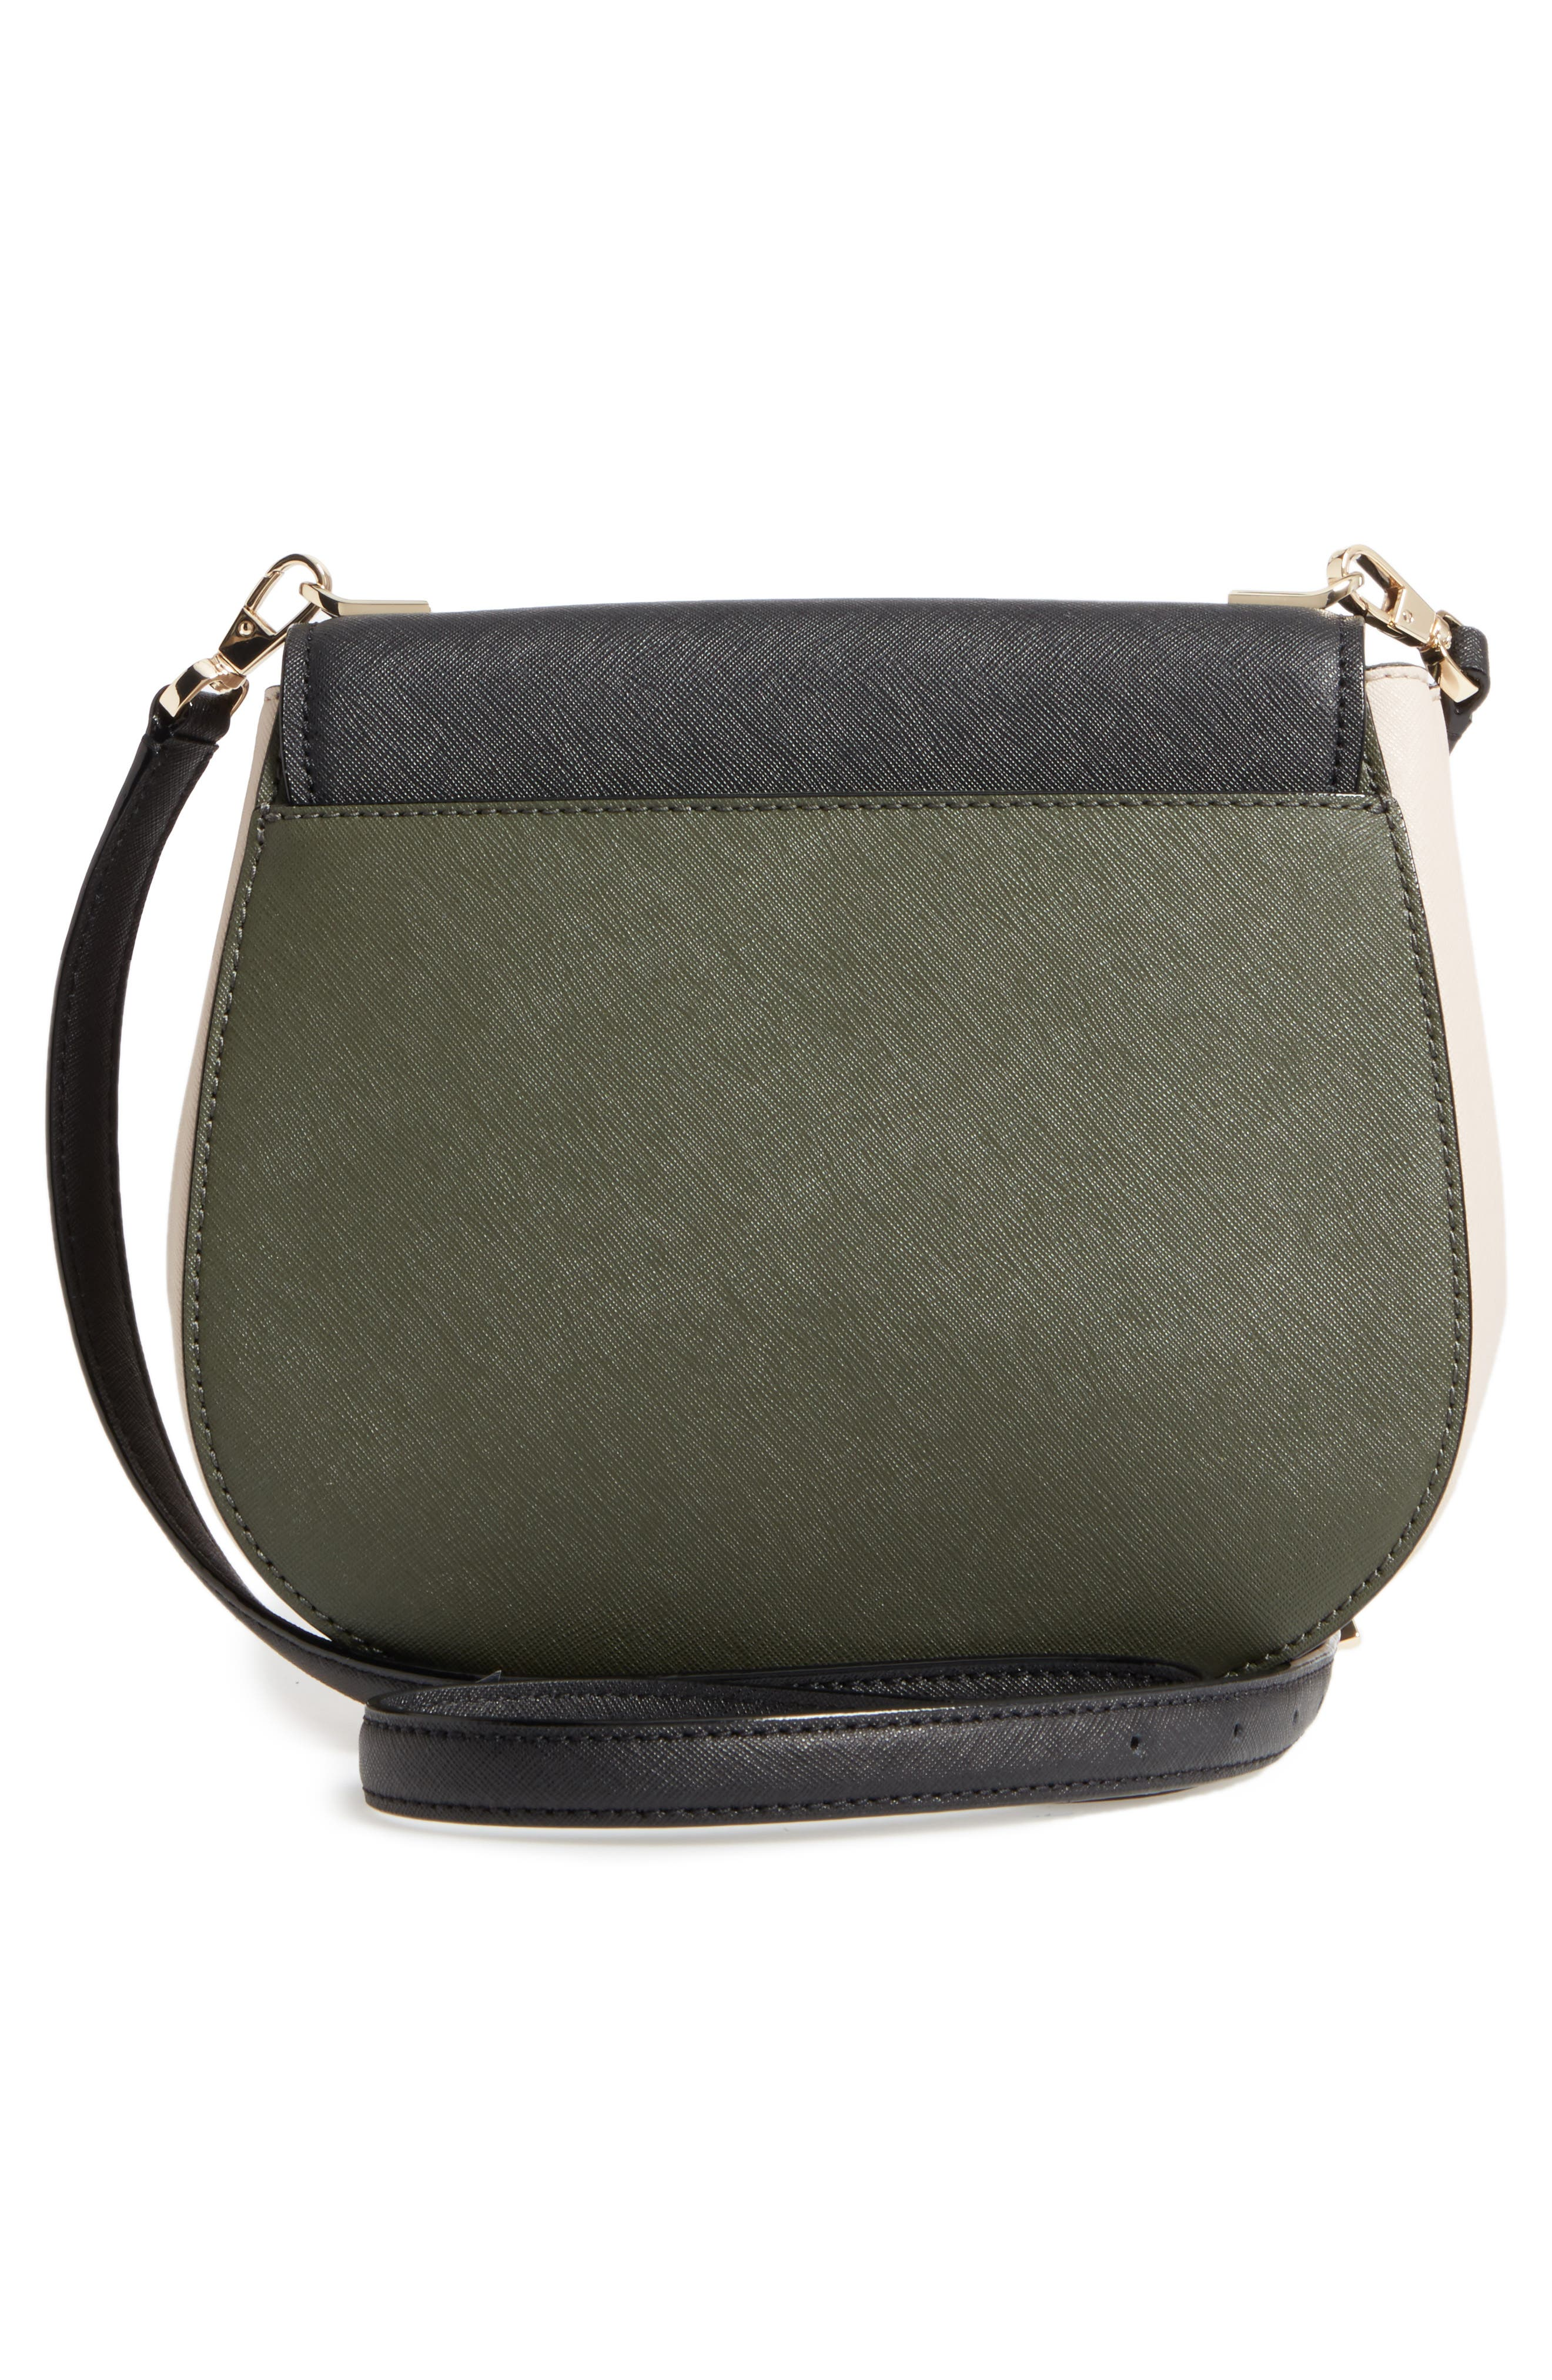 cameron street - byrdie leather crossbody bag,                             Alternate thumbnail 3, color,                             301